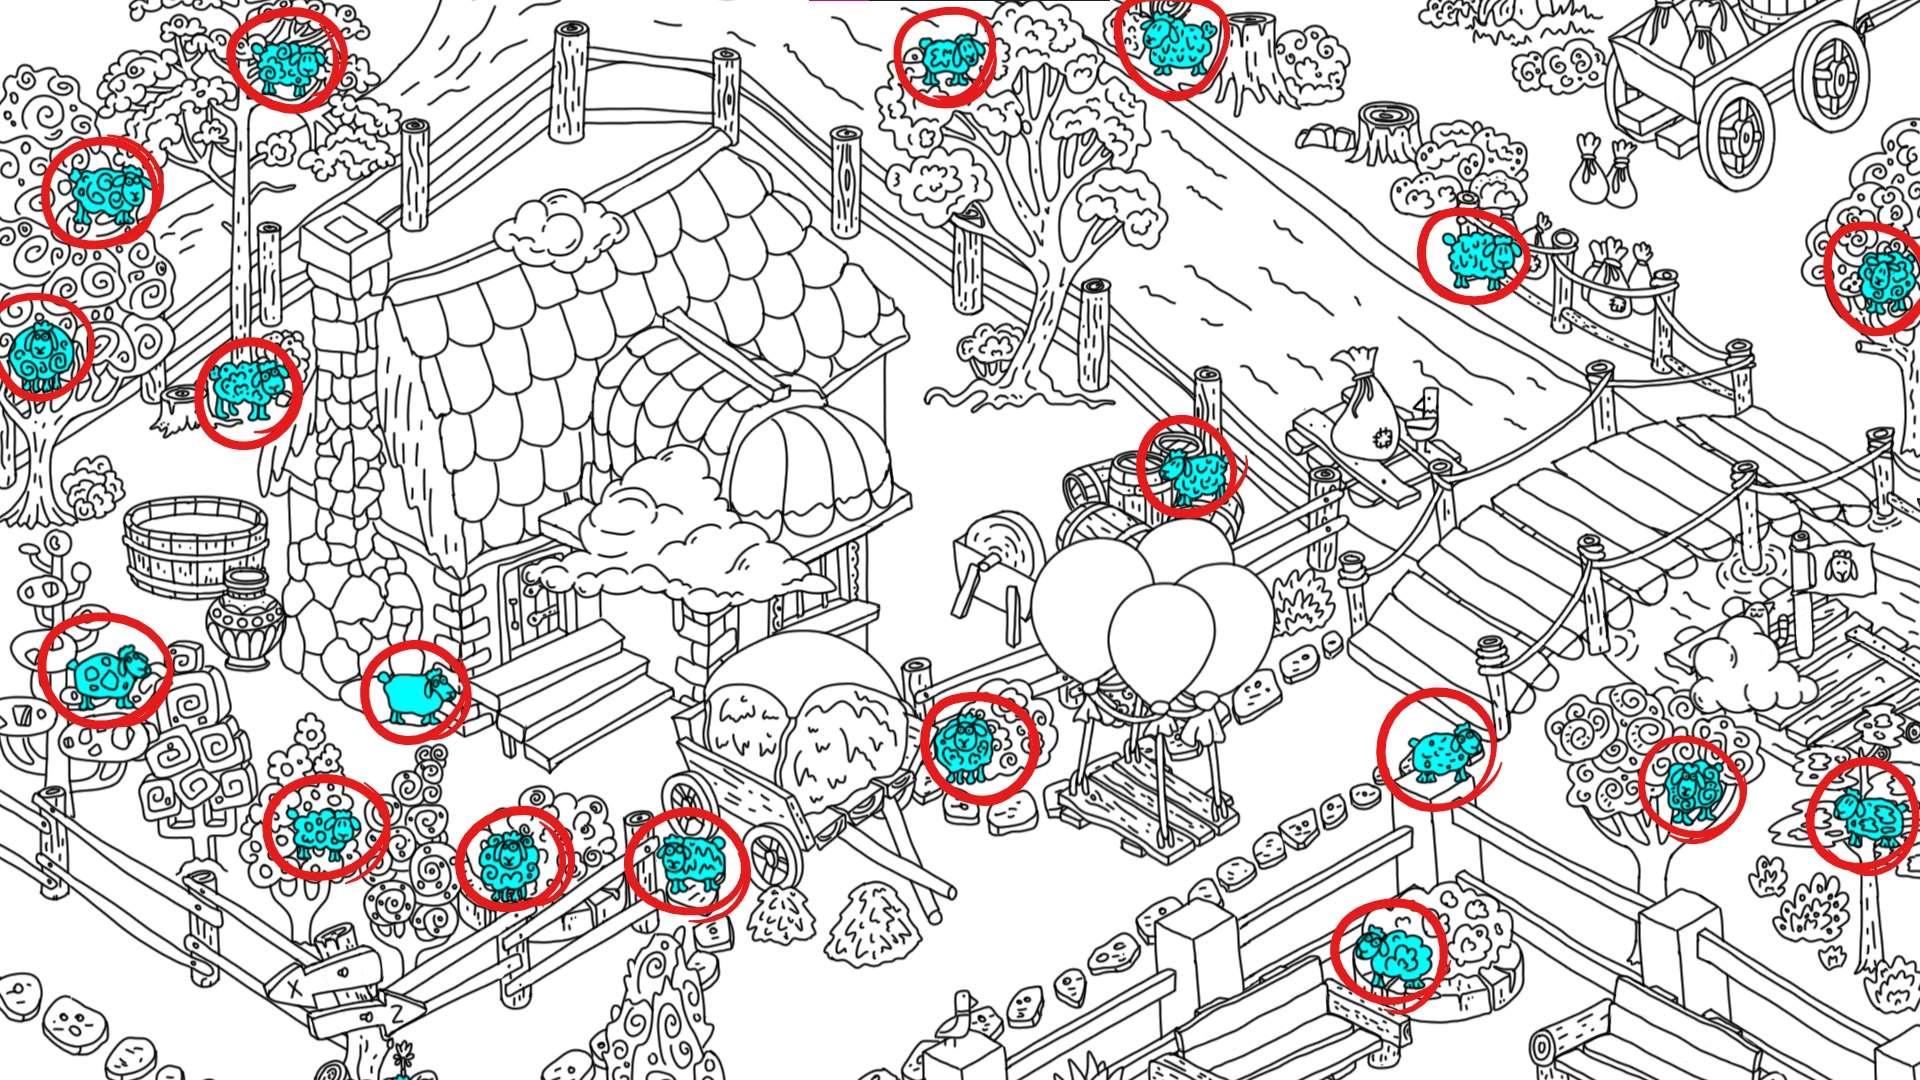 100 hidden rams - All Hidden Ram Location - Map Guide - all rams - 32565ED